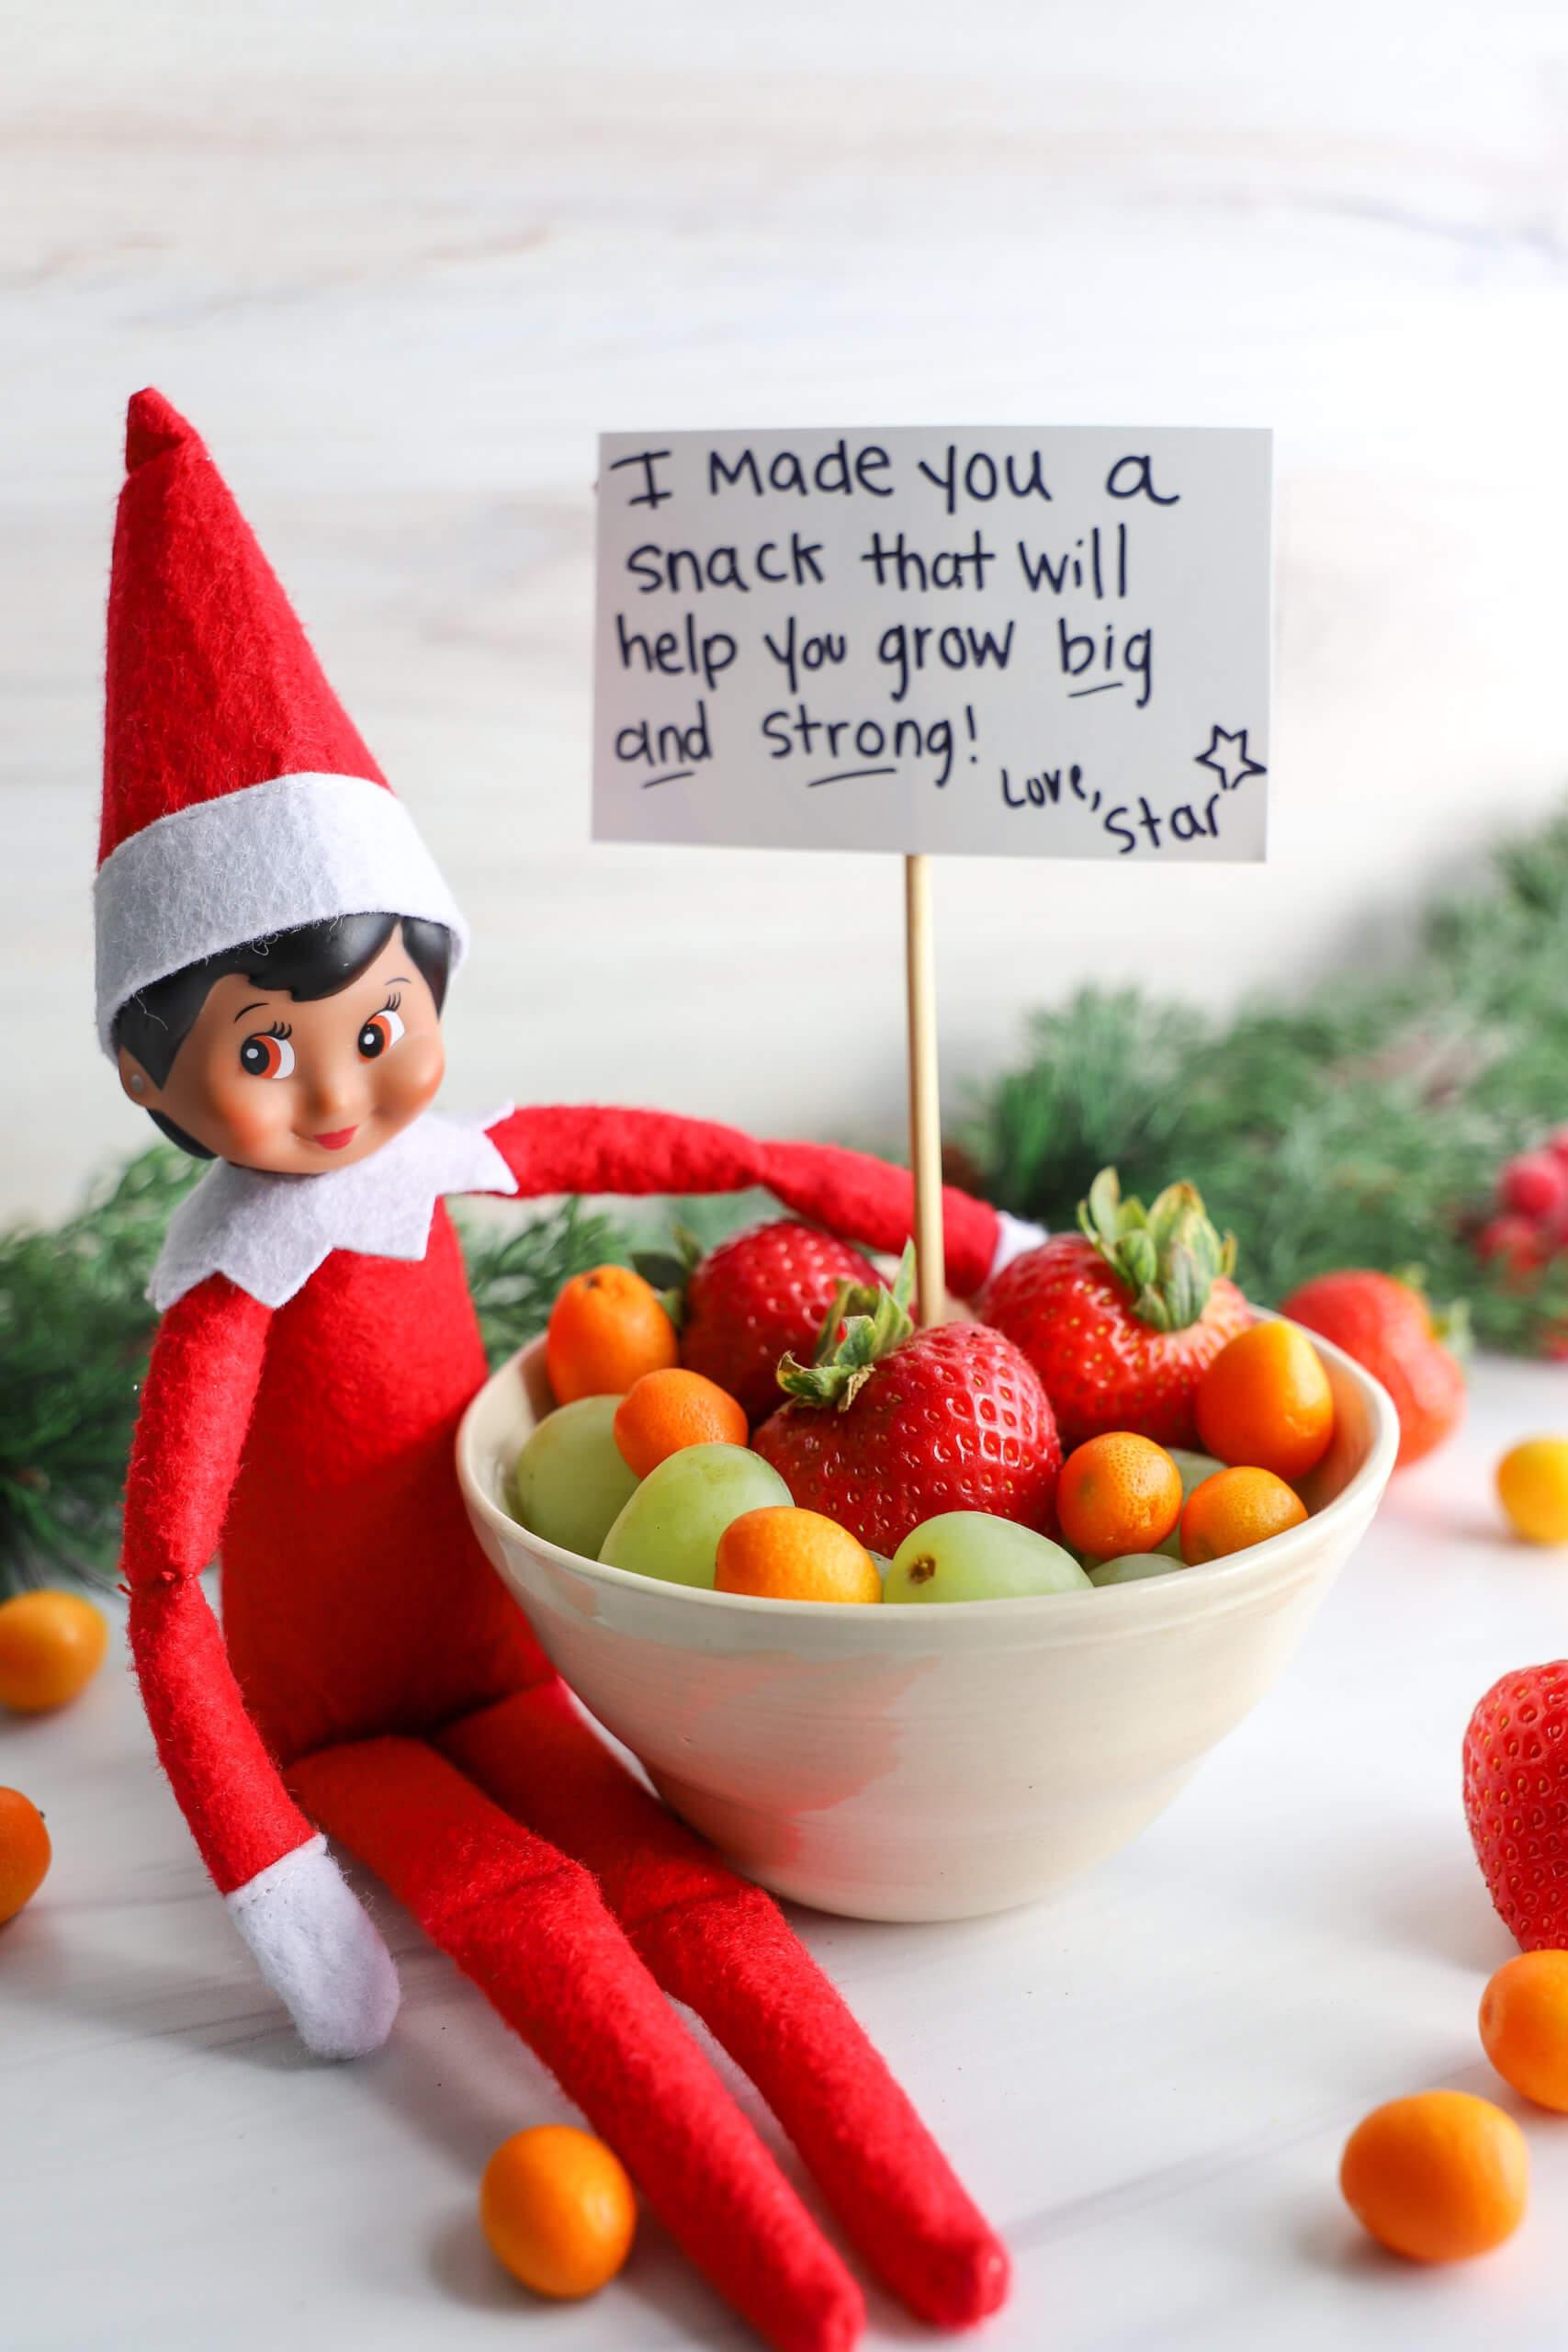 Easy Elf on the Shelf Ideas: Making a Healthy Snack